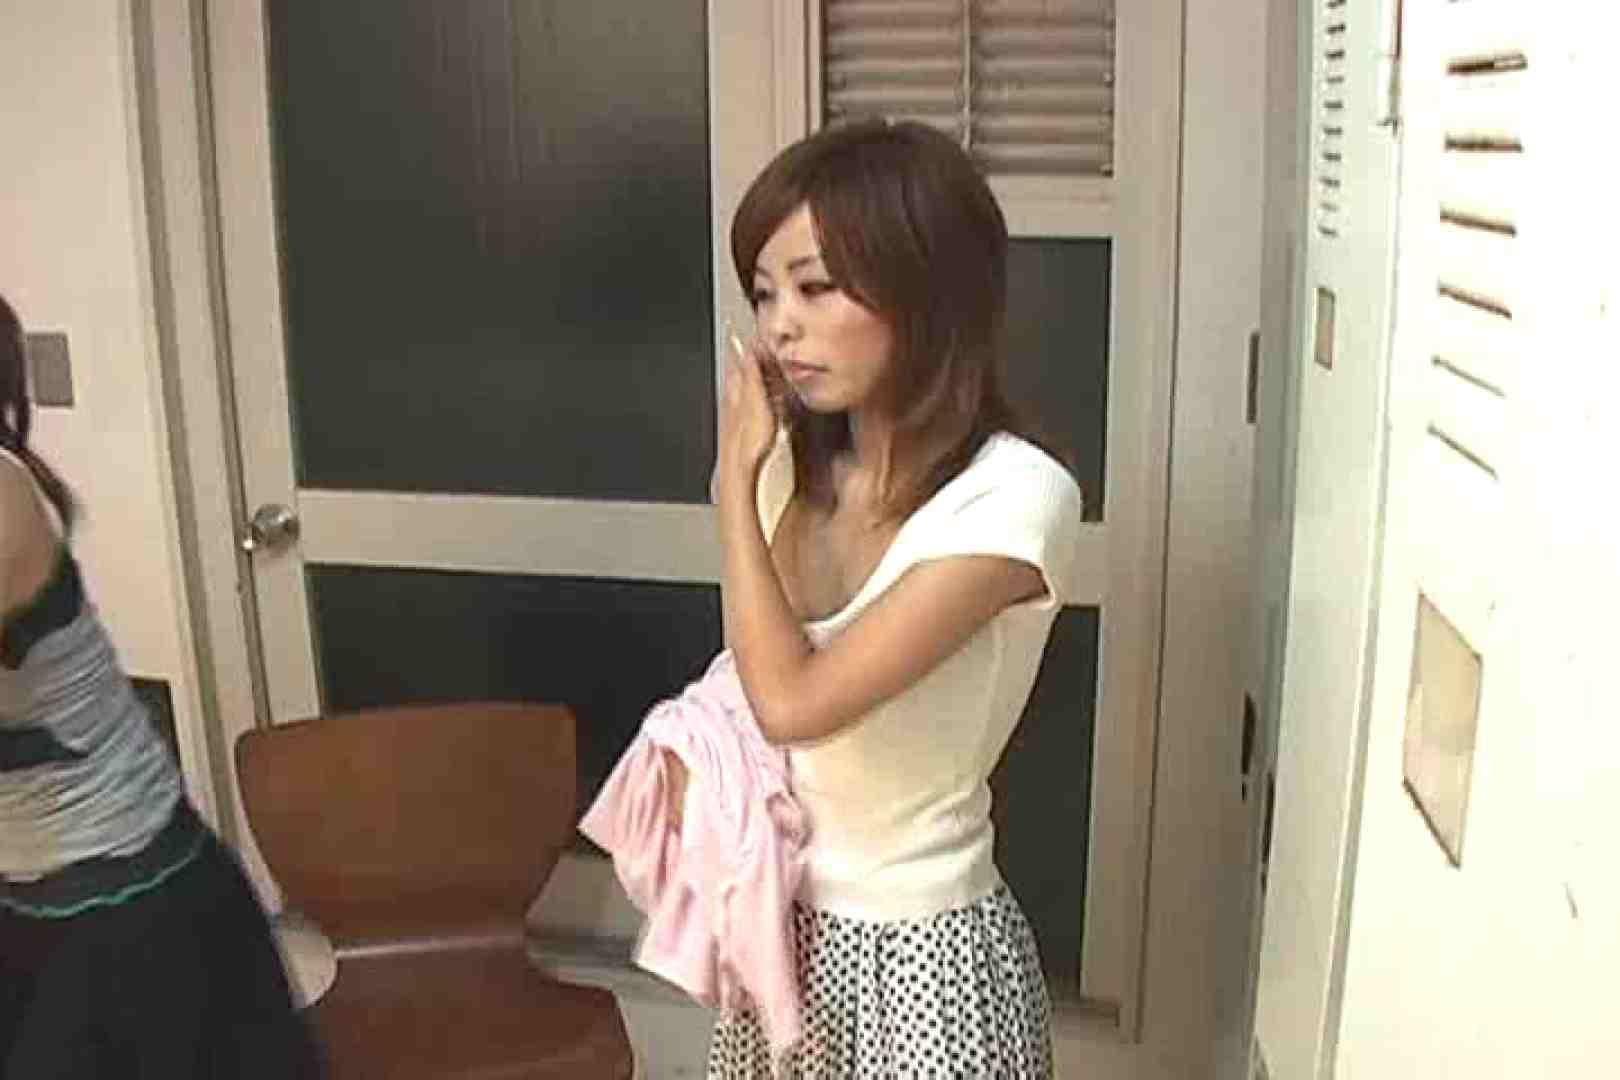 キャバ嬢舞台裏Vol.3 盗撮特集 オメコ無修正動画無料 100画像 97